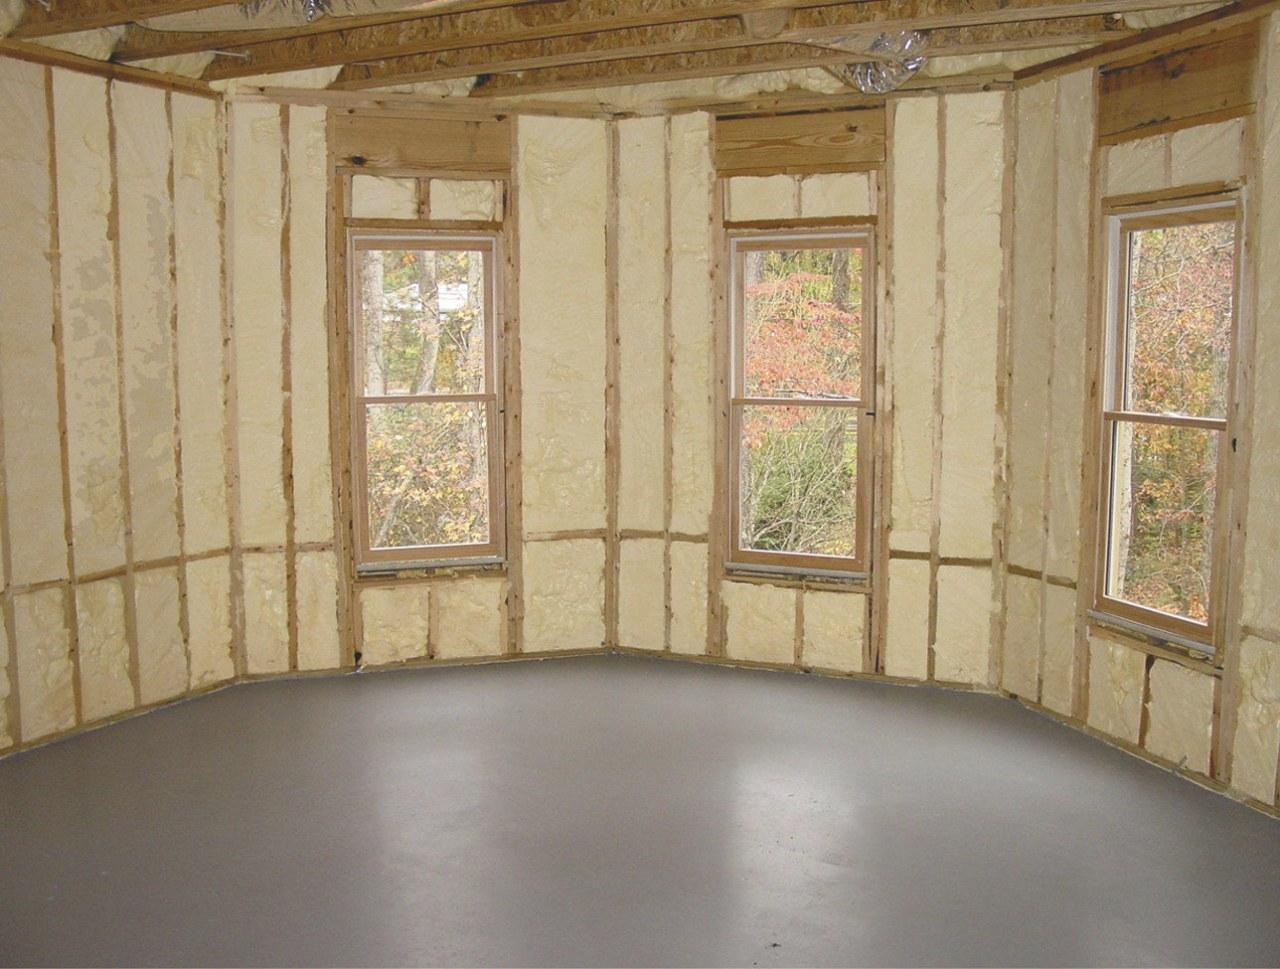 Icynene Spray Foam starts of as a liqquid ceiling, floor, home, interior design, property, real estate, wall, window, orange, gray, brown